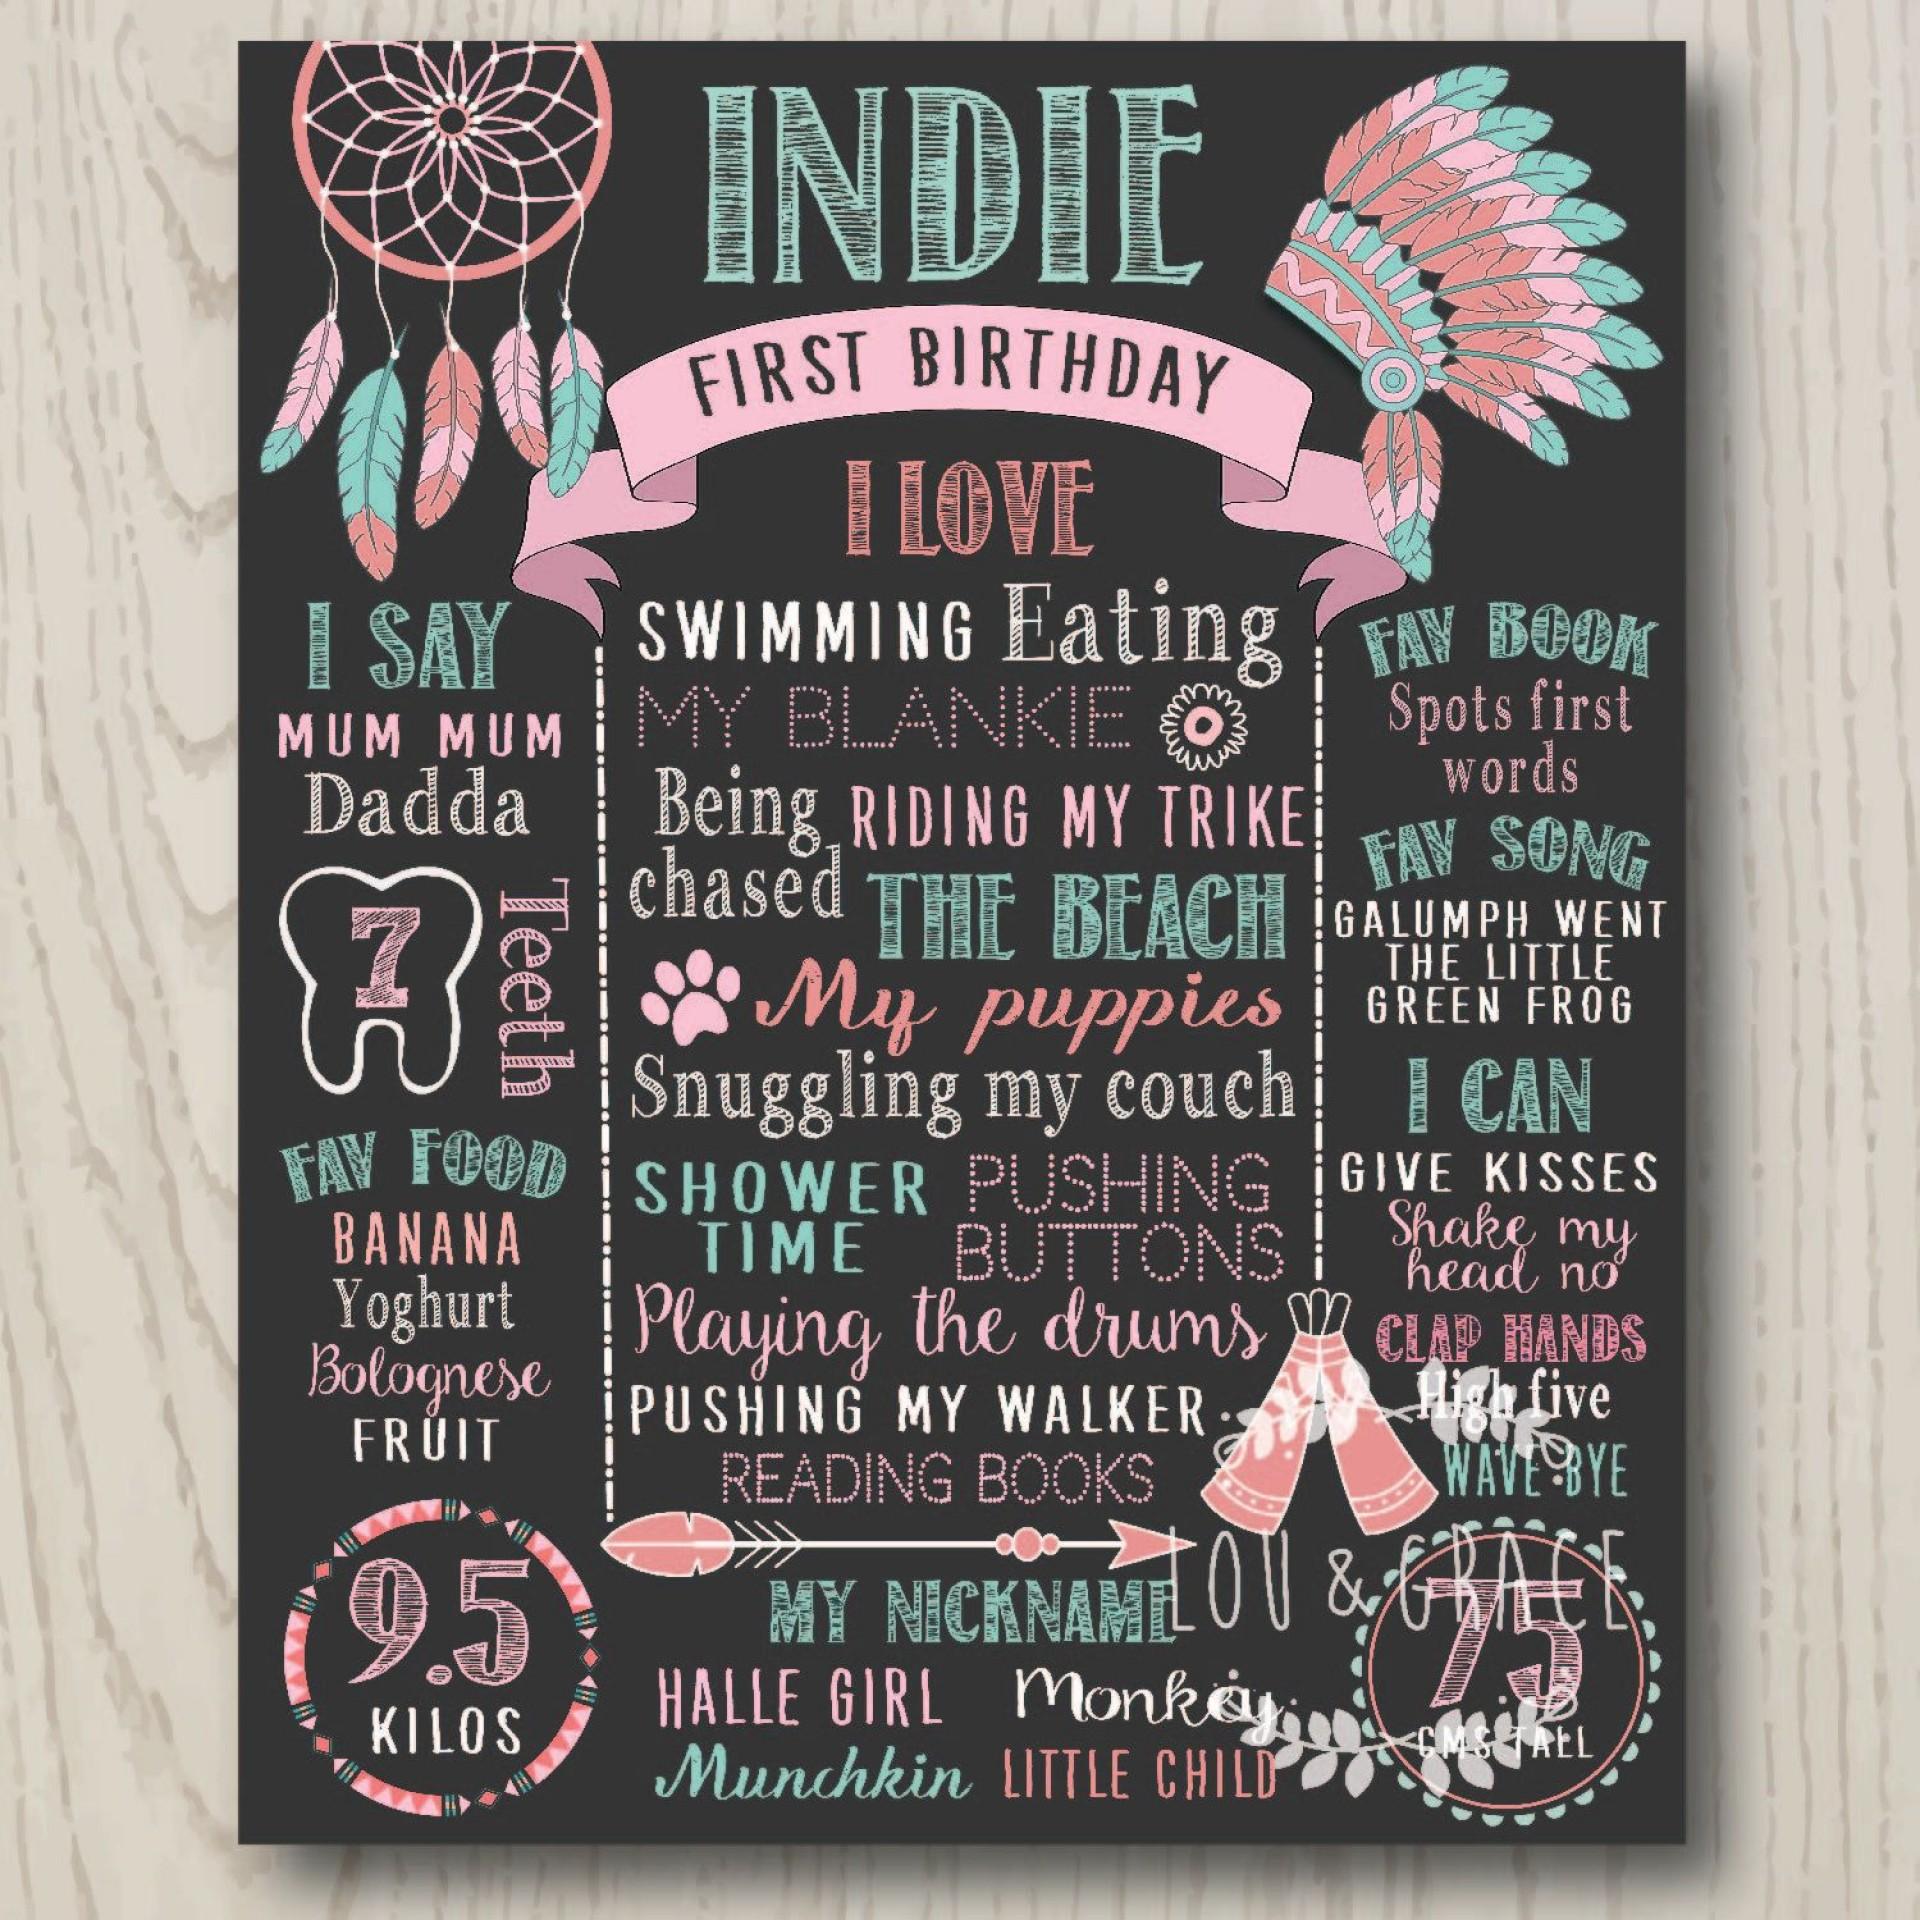 002 Stirring First Birthday Chalkboard Template Highest Clarity  Diy Printable Free1920